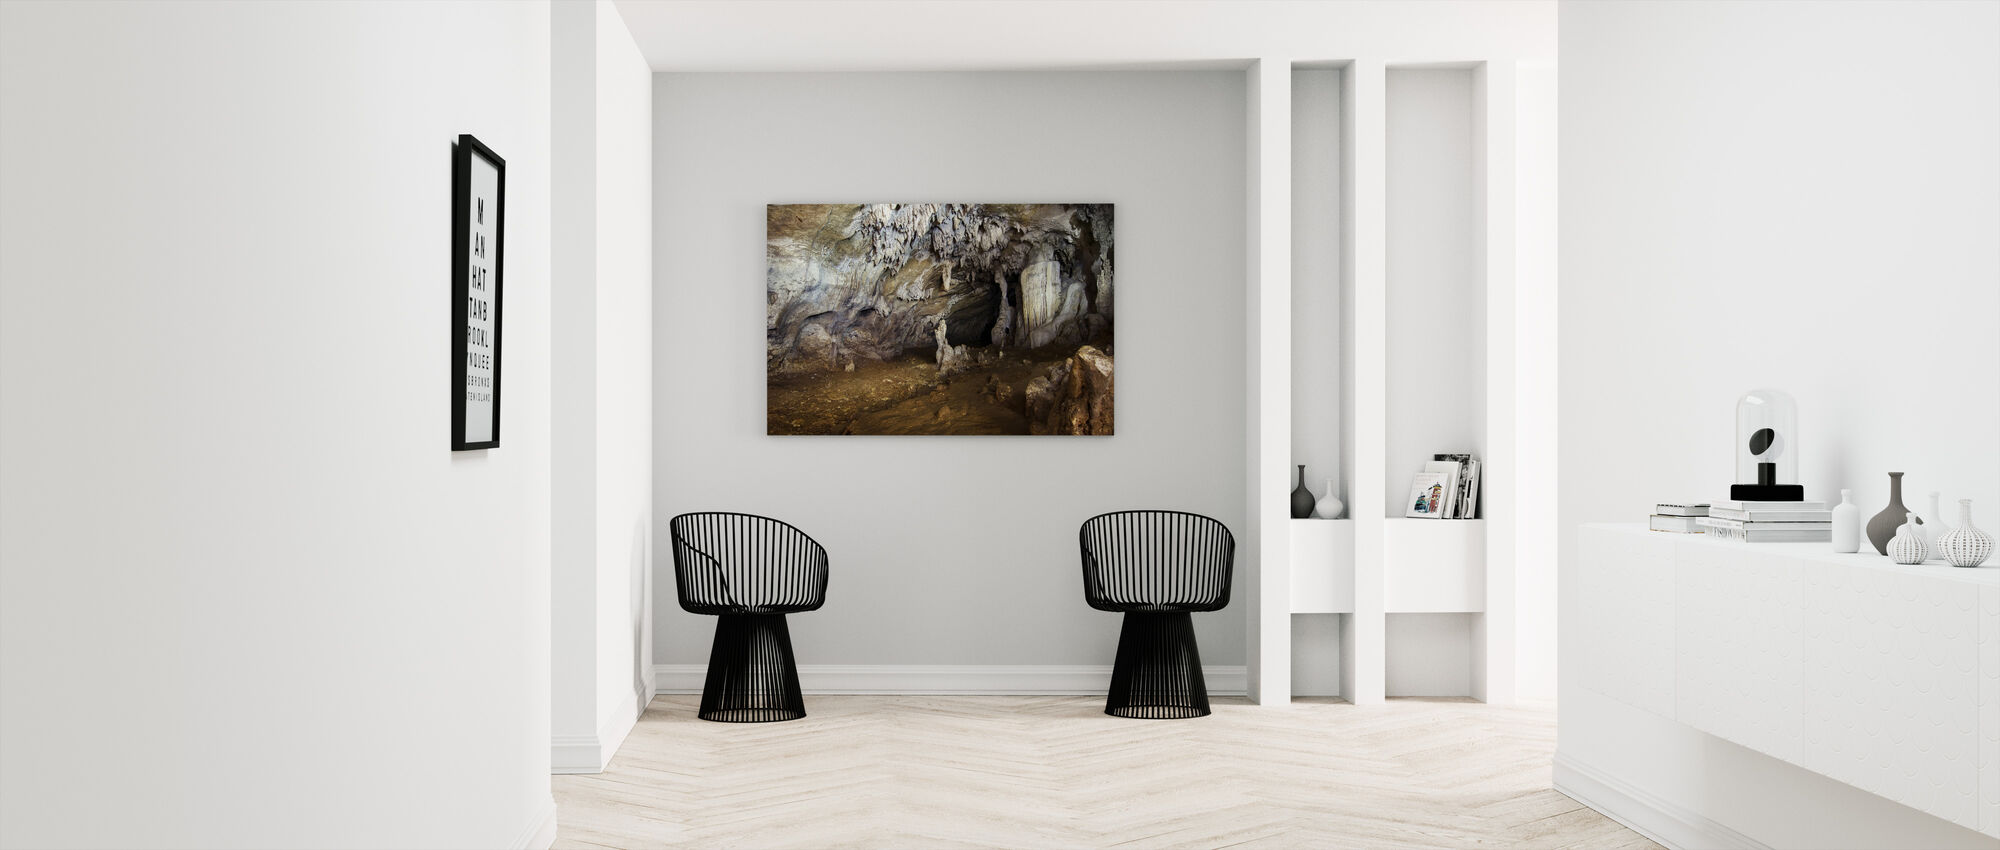 Sohoton grotta - Canvastavla - Hall